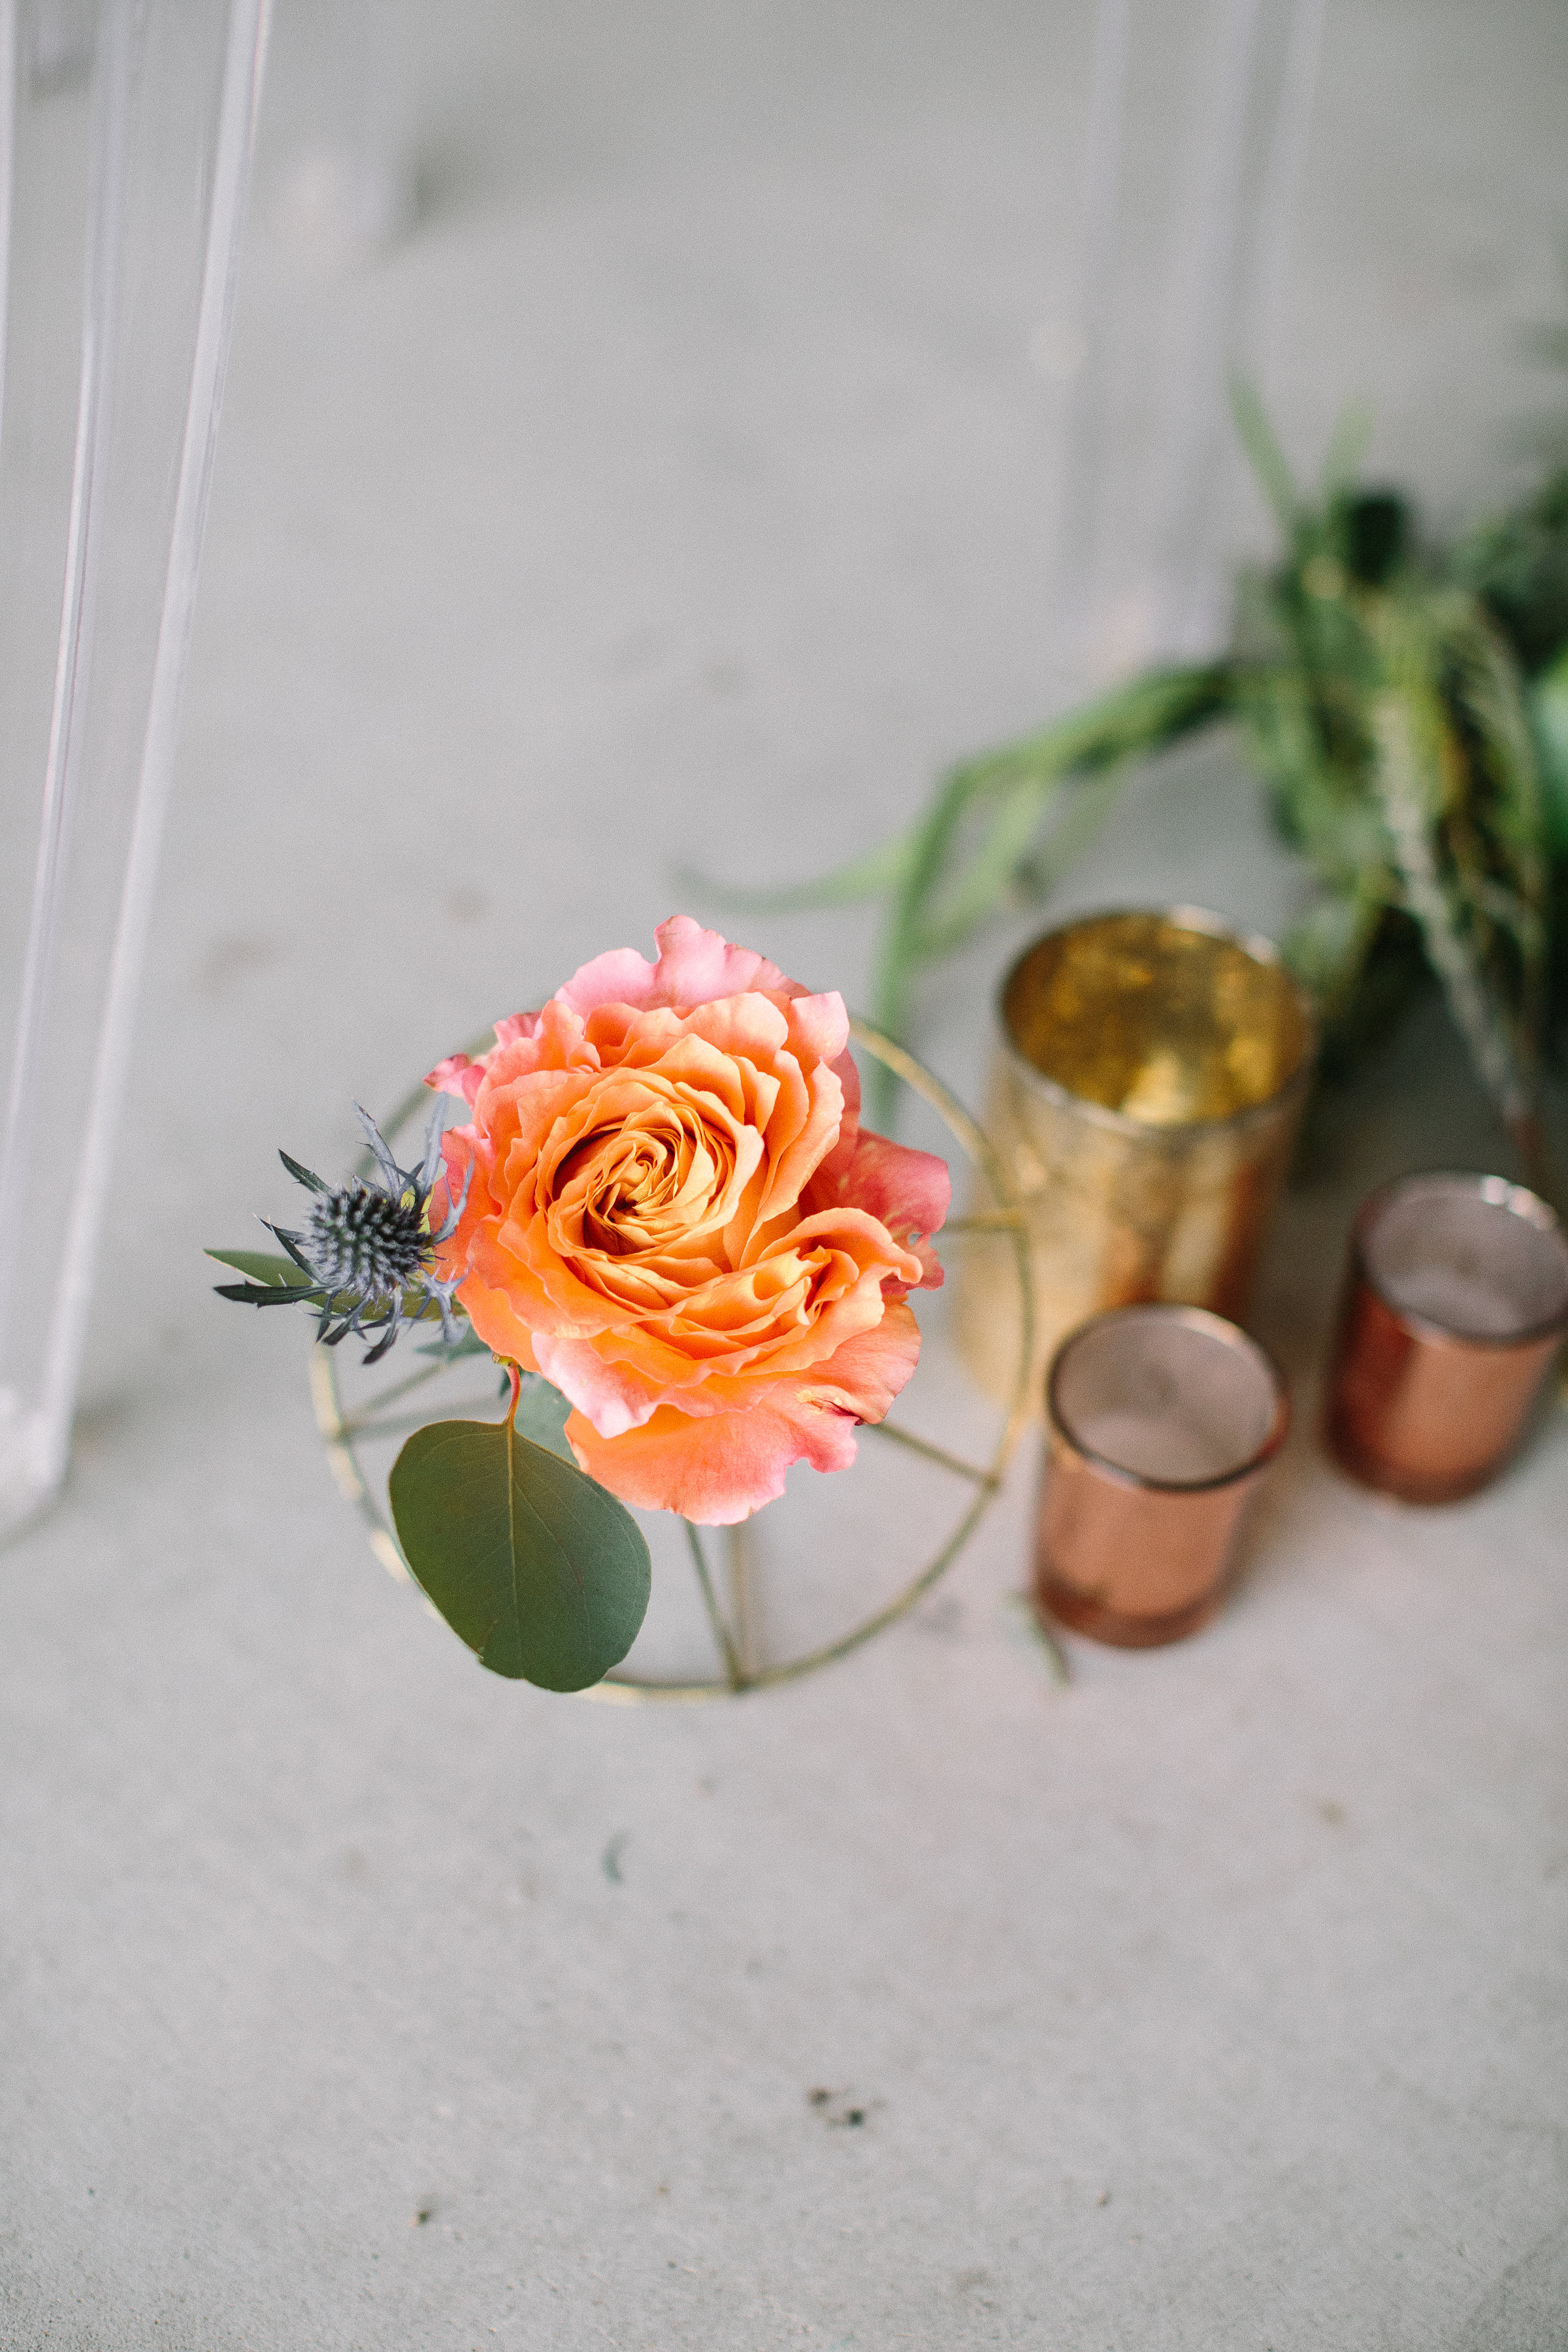 Ellen-Ashton-Photography-Peach-Creek-Ranch-Weddings-Wed-and-Prosper367